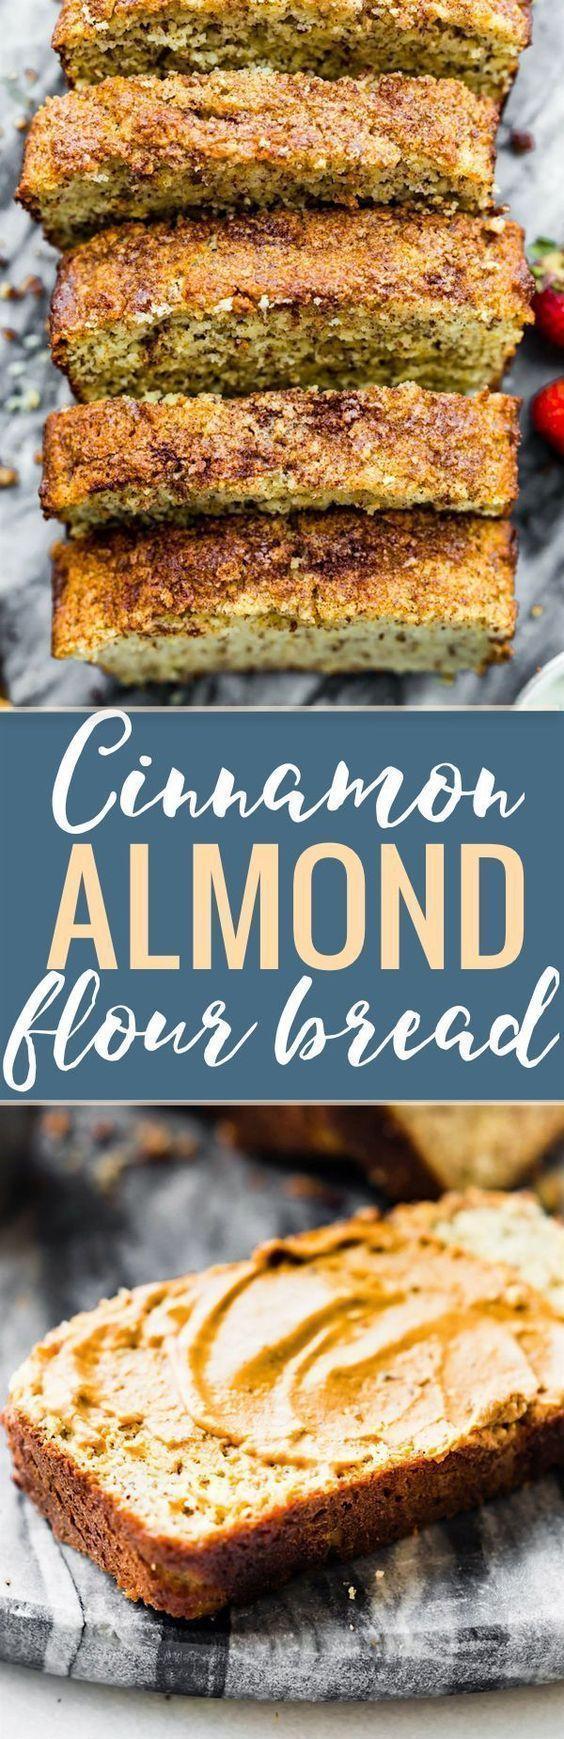 Cinnamon Almond Flour Bread Recipe {Paleo} | Cotter Crunch | Recipe |  Almond flour bread recipes, Almond flour bread, Diy food recipes